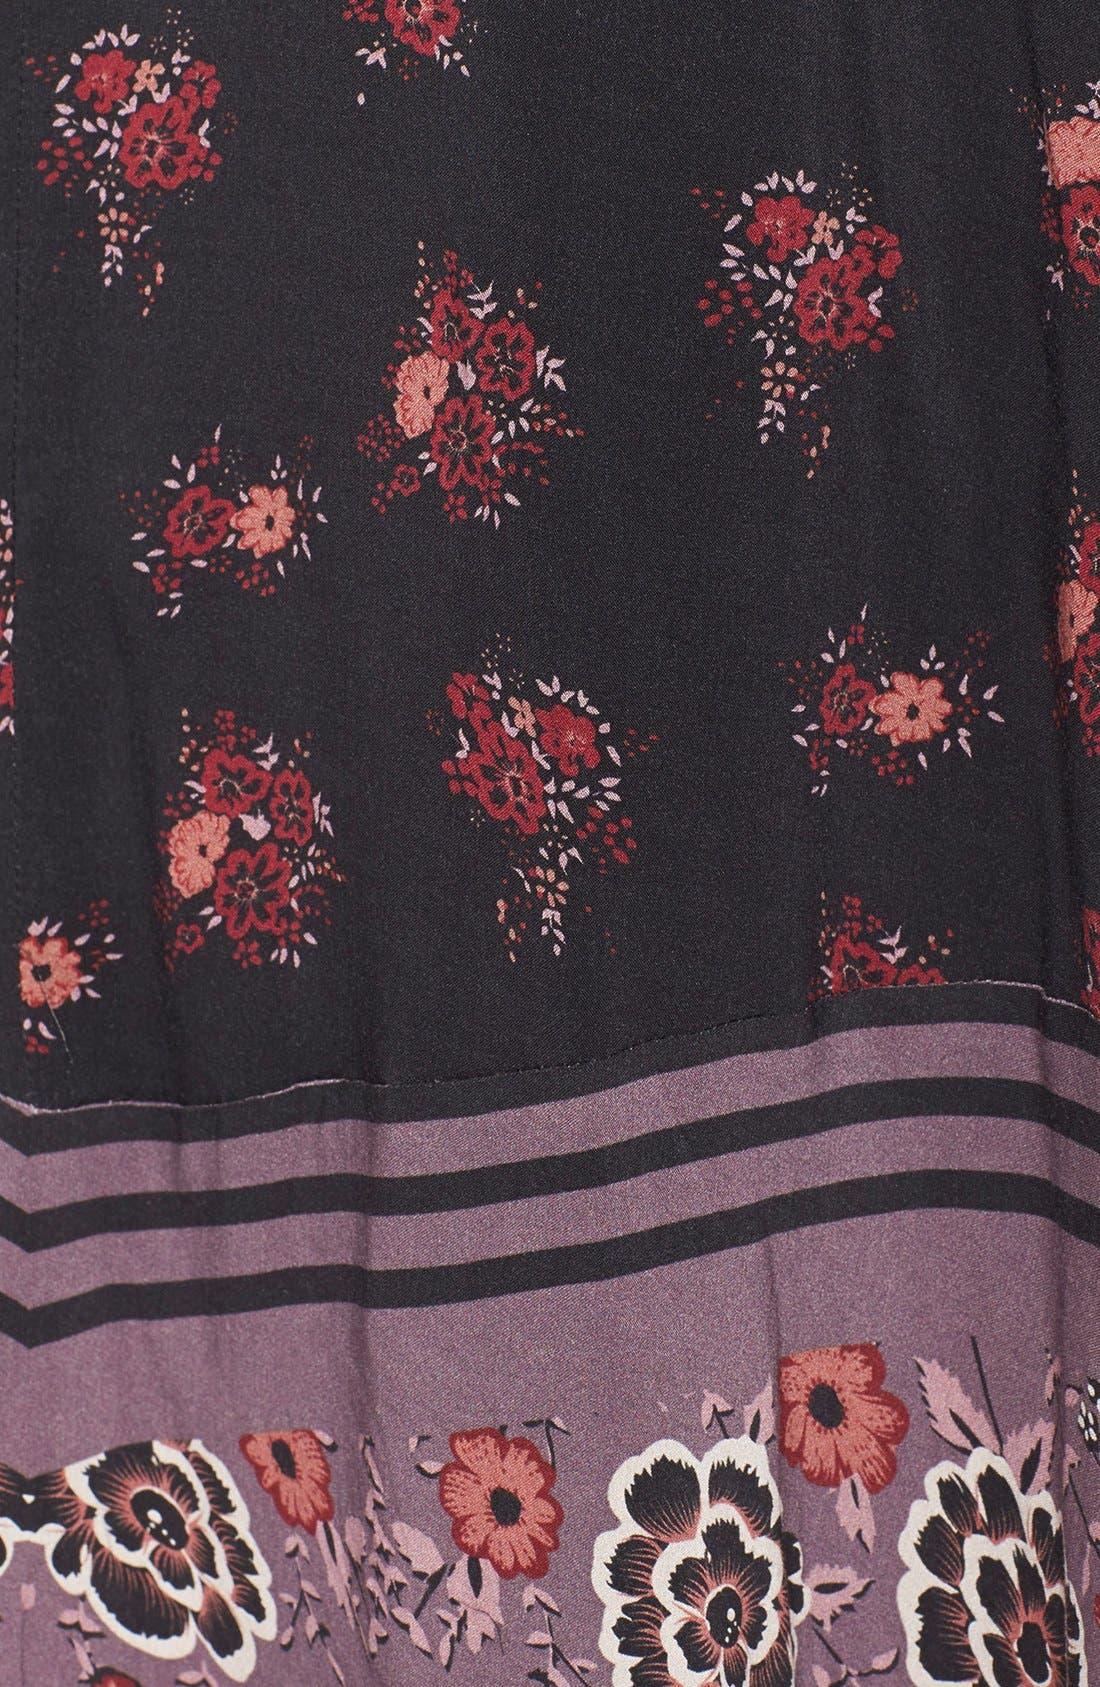 FREE PEOPLE,                             'Sunrise Oblivion' Floral Print Dress,                             Alternate thumbnail 3, color,                             001